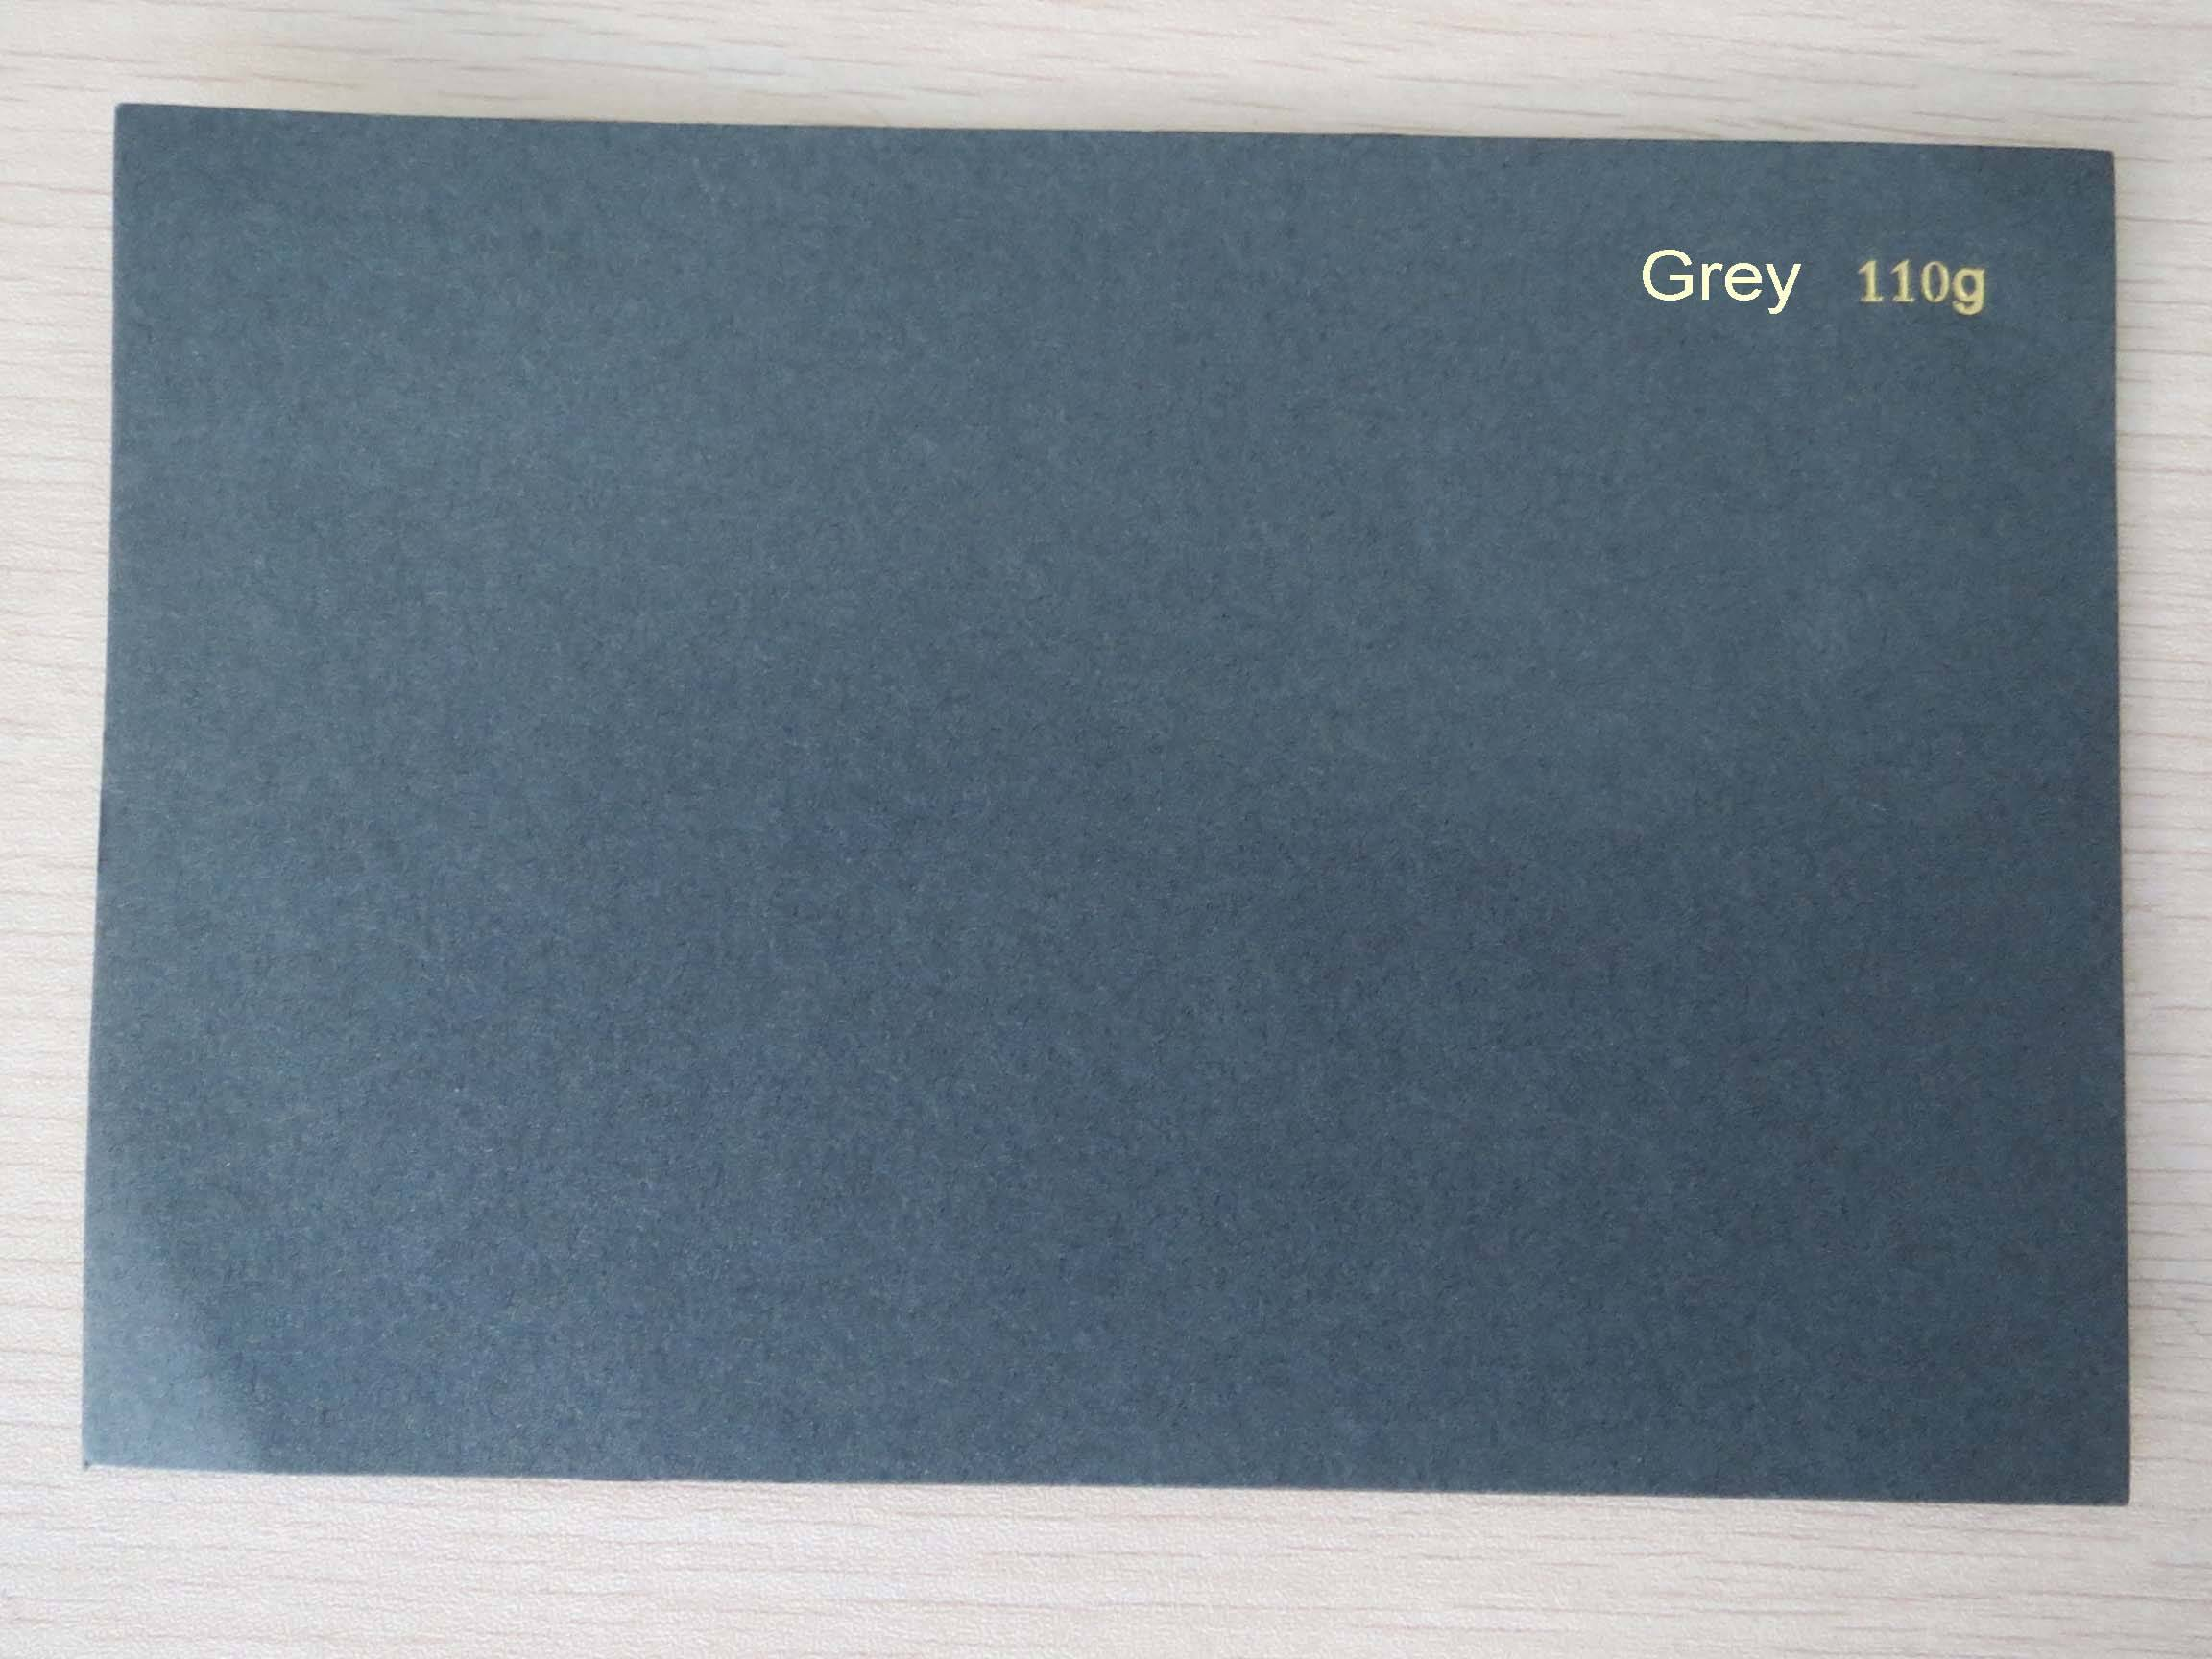 110g Grey Cardboard, Grey Paperboard, Colored Paper